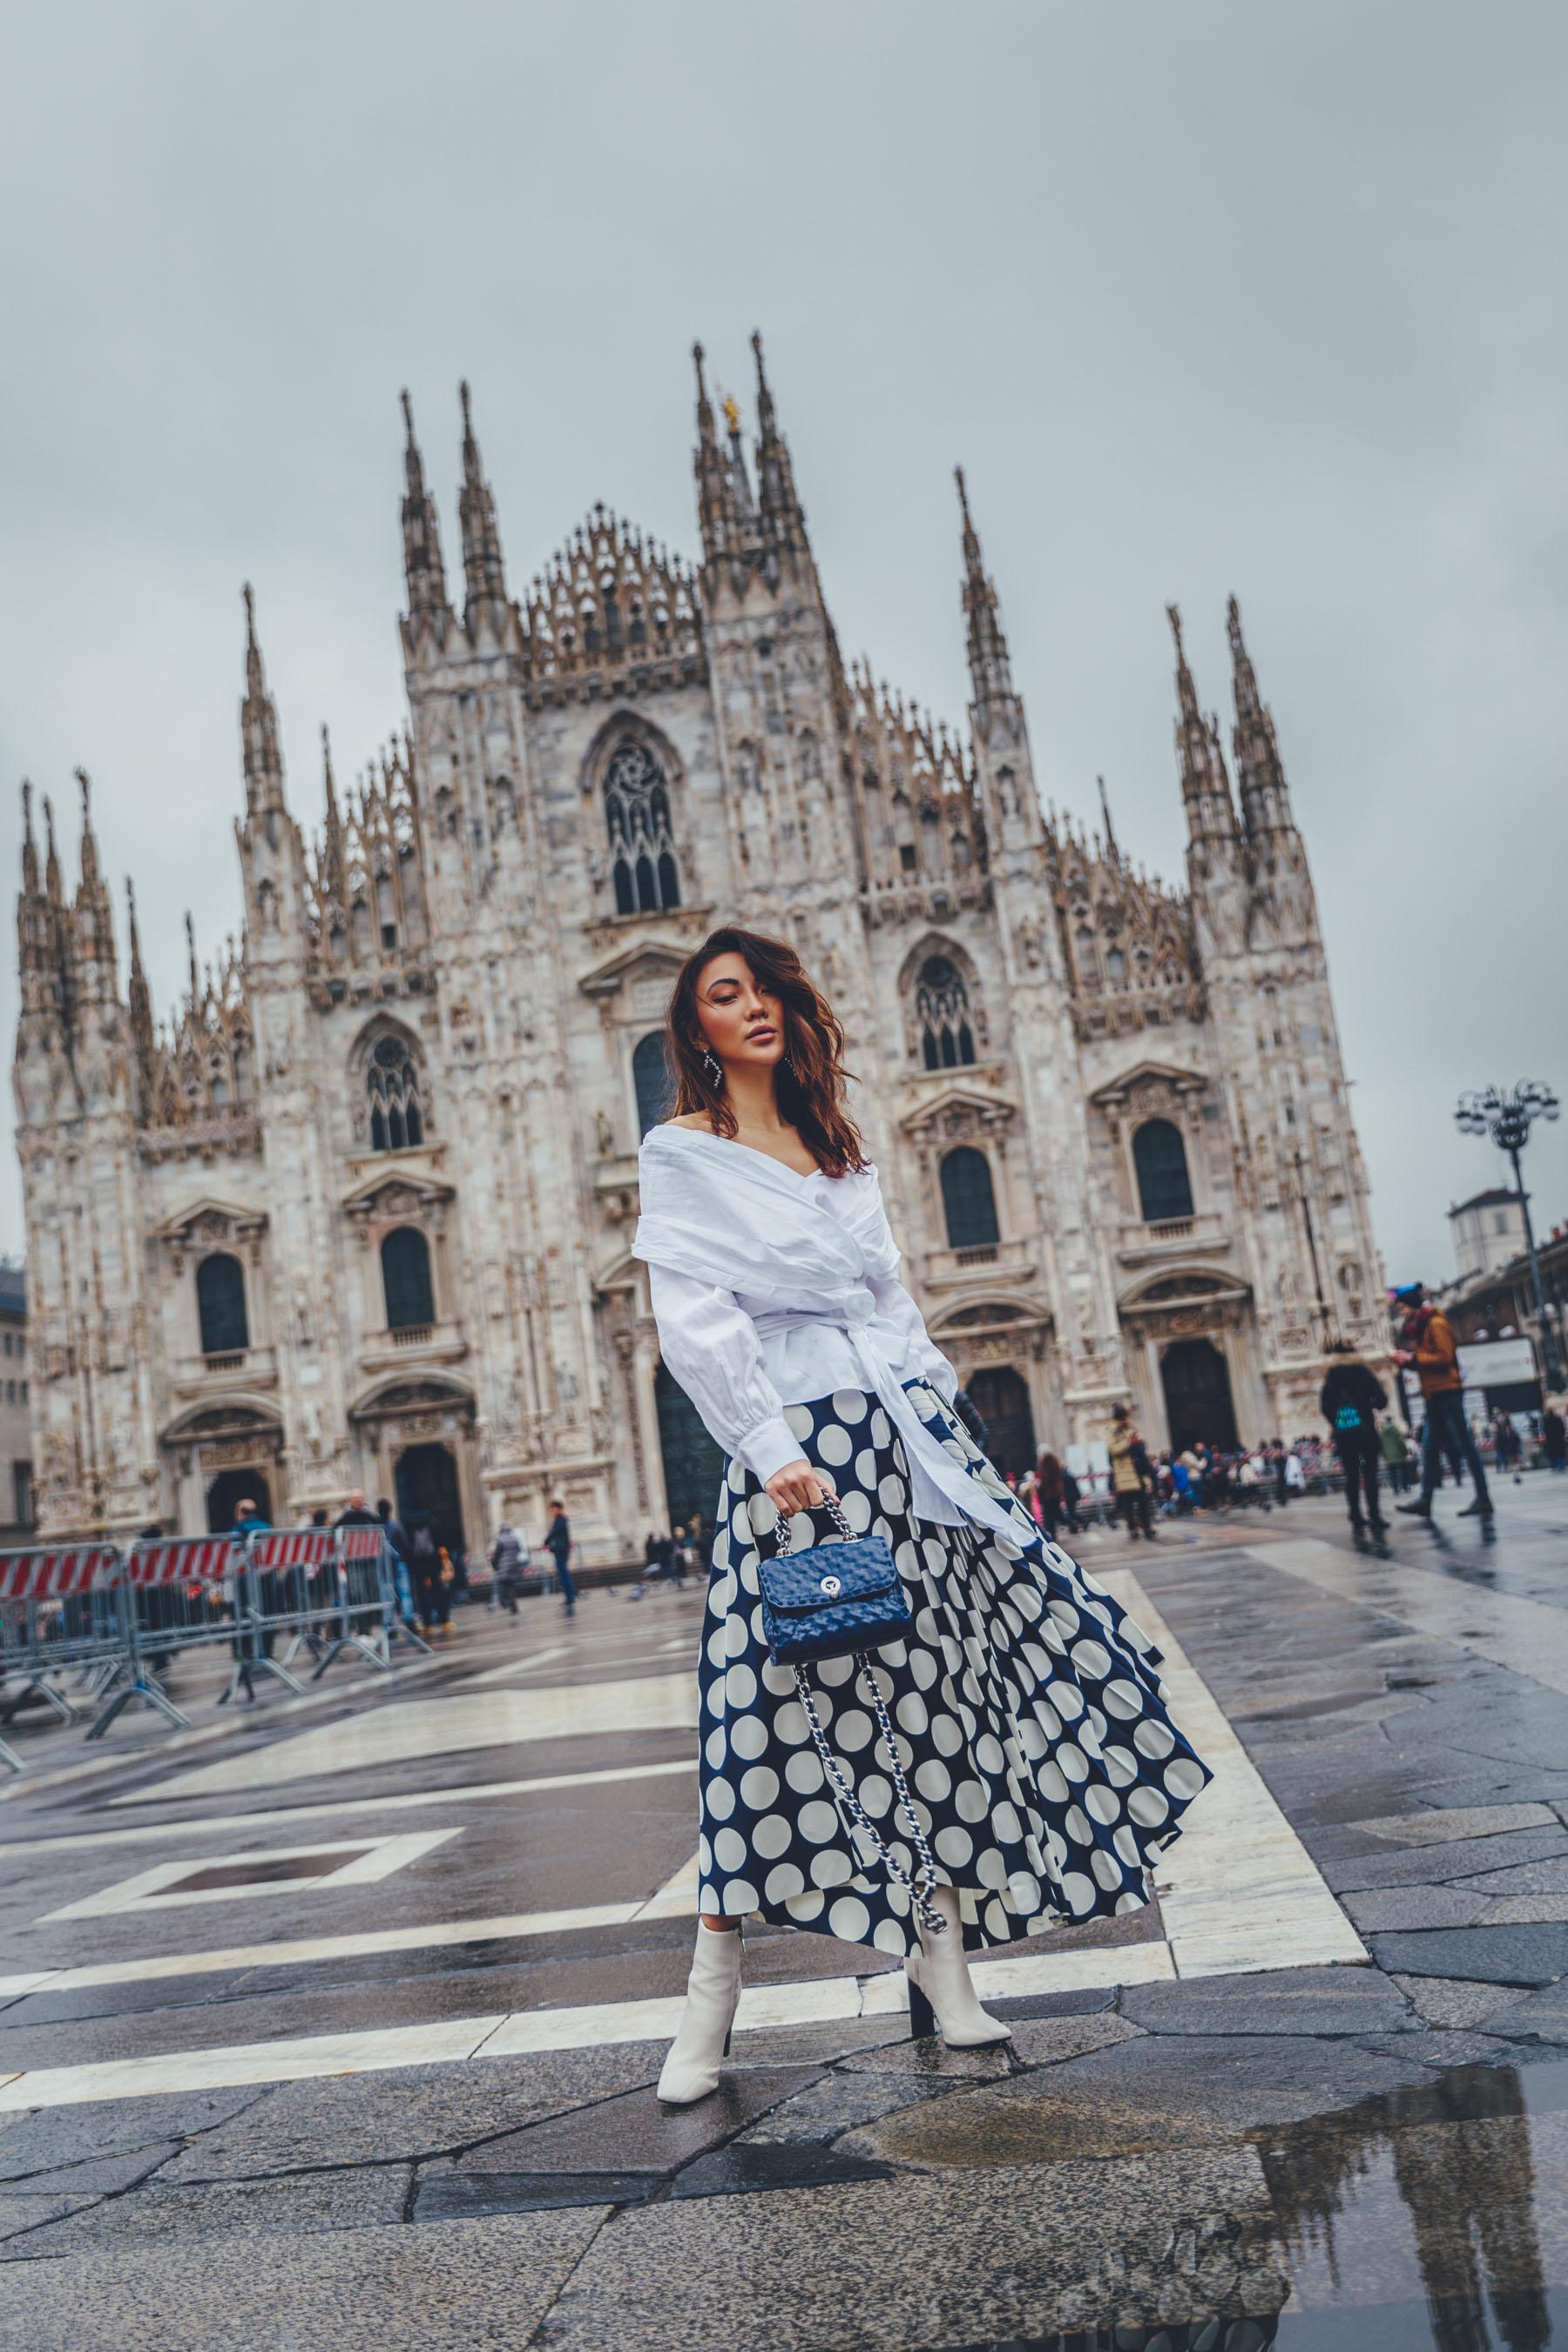 MFW Recap - polka dot skirt with wrap top, MFW Street Style, fashion week street style // Notjessfashion.com